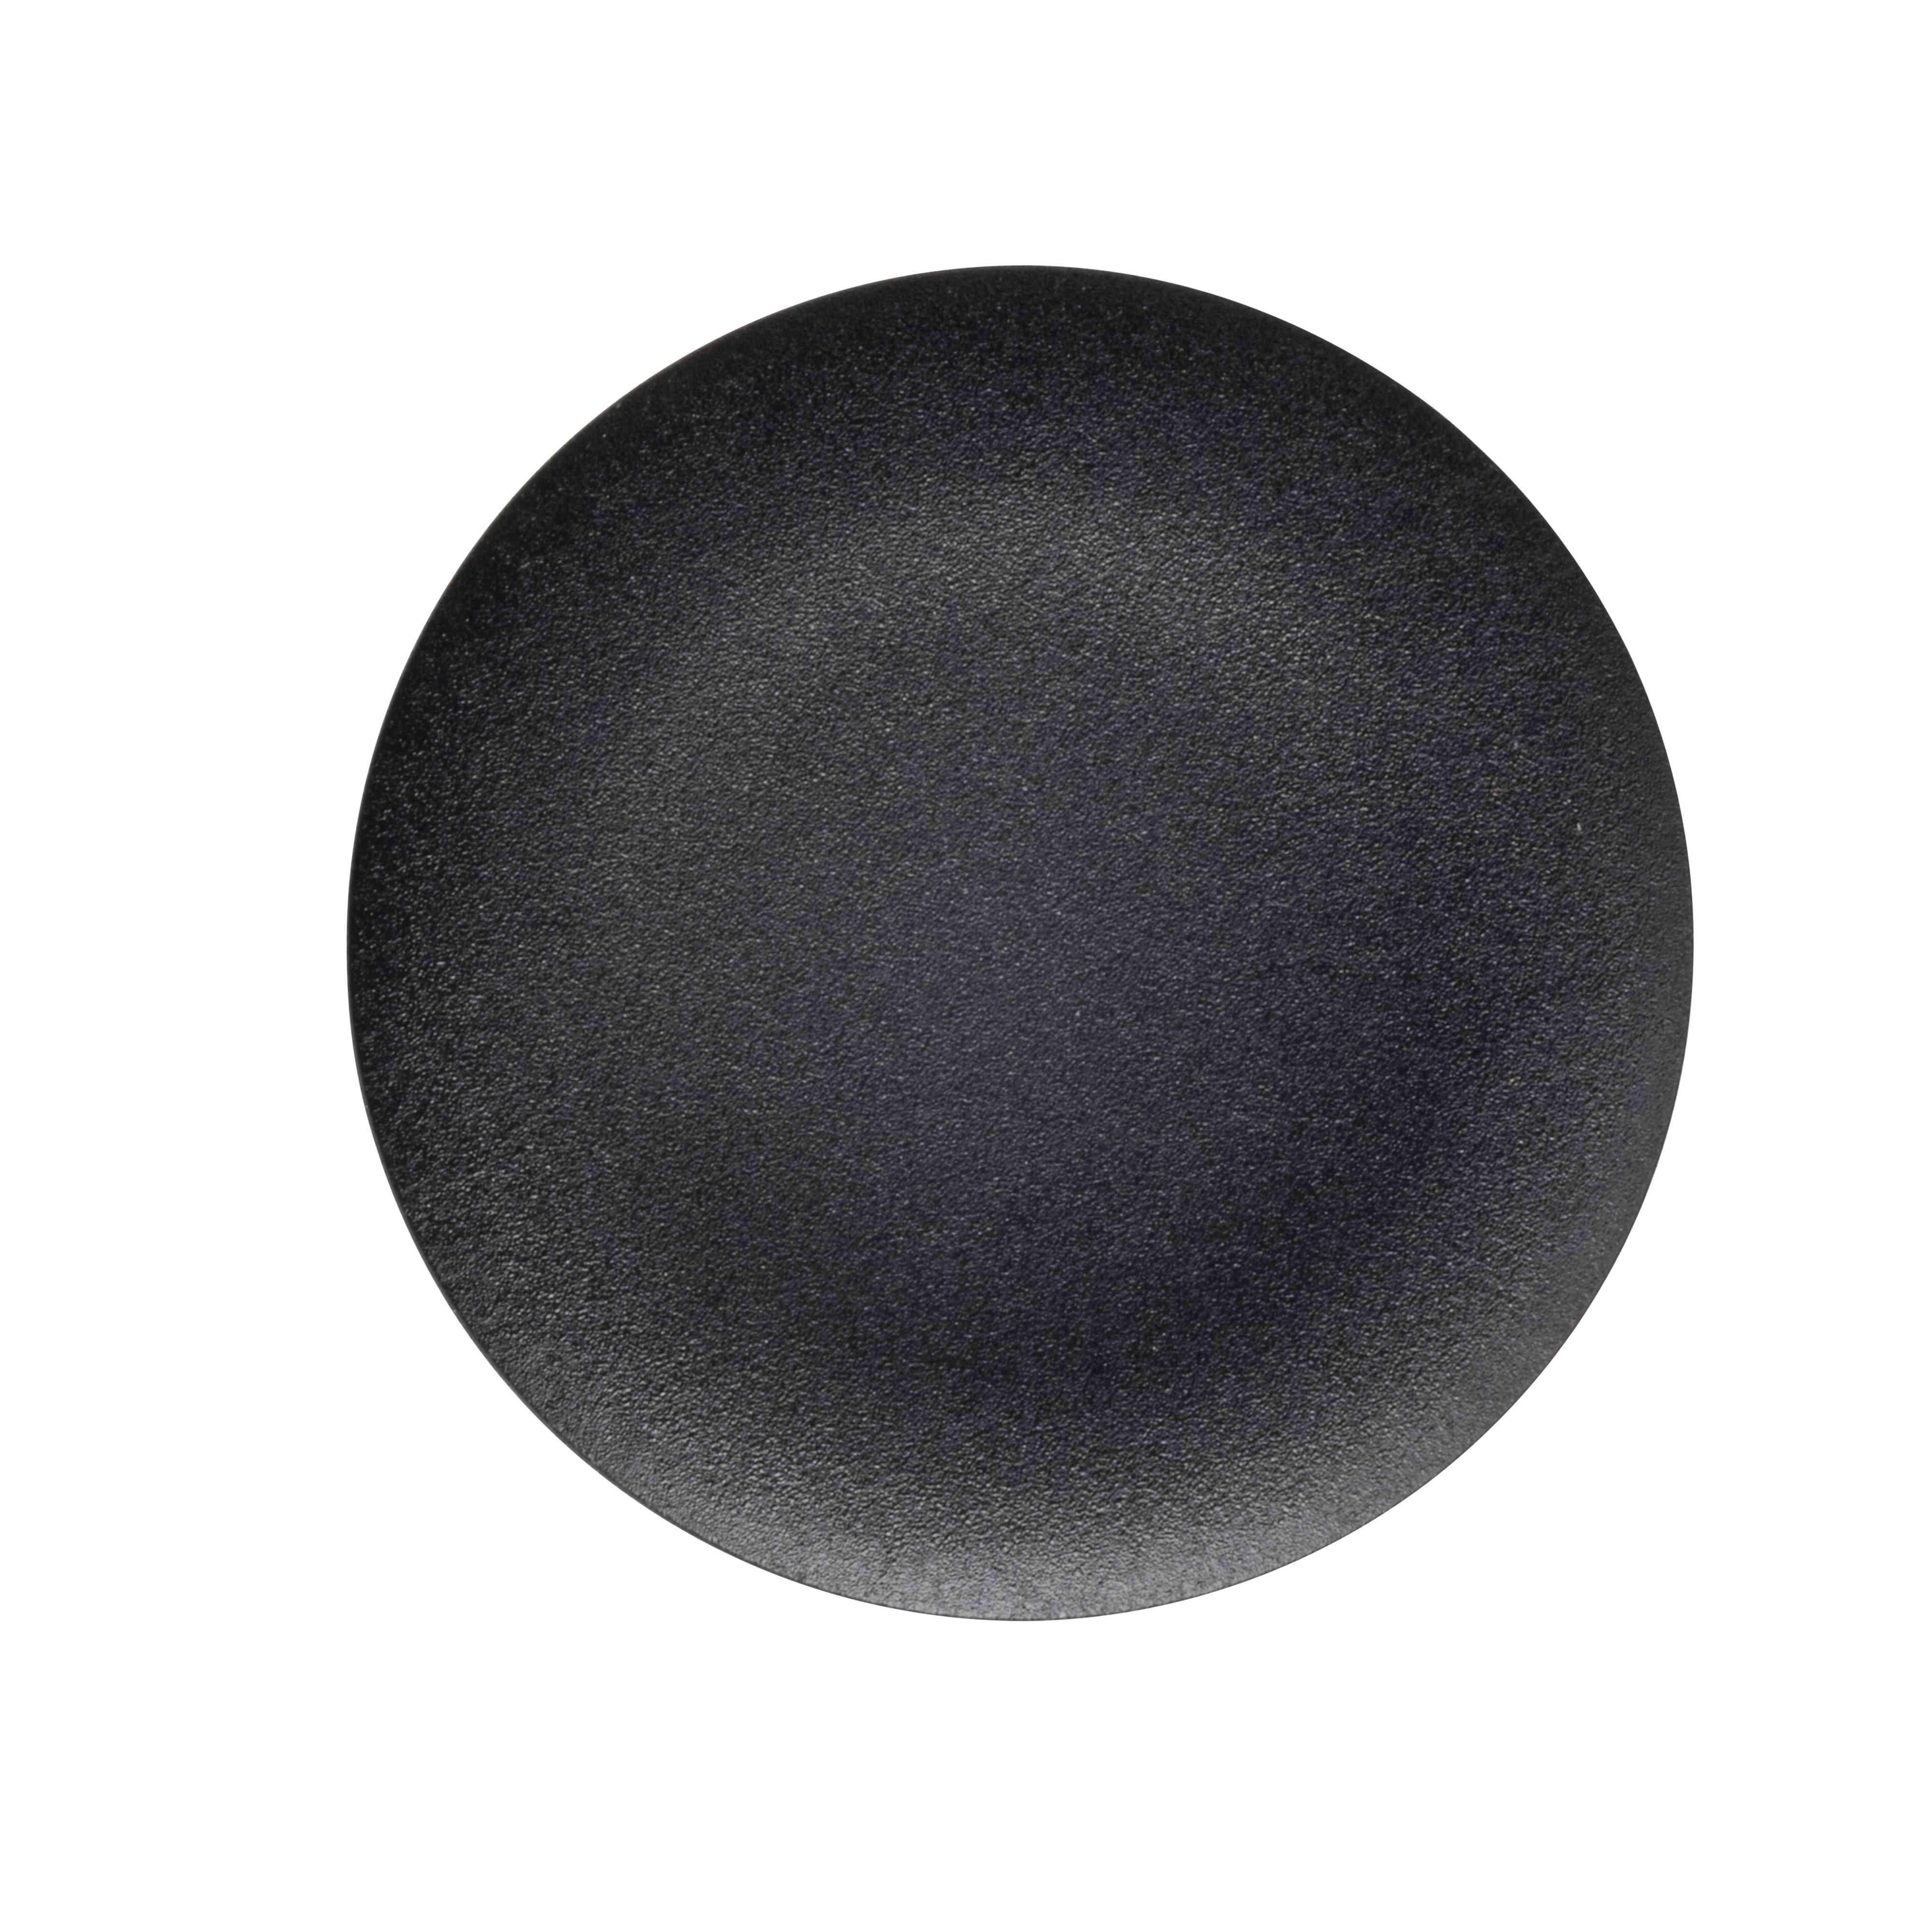 Neoznačen črn pokrov za krožno podometno tipko Ø 22